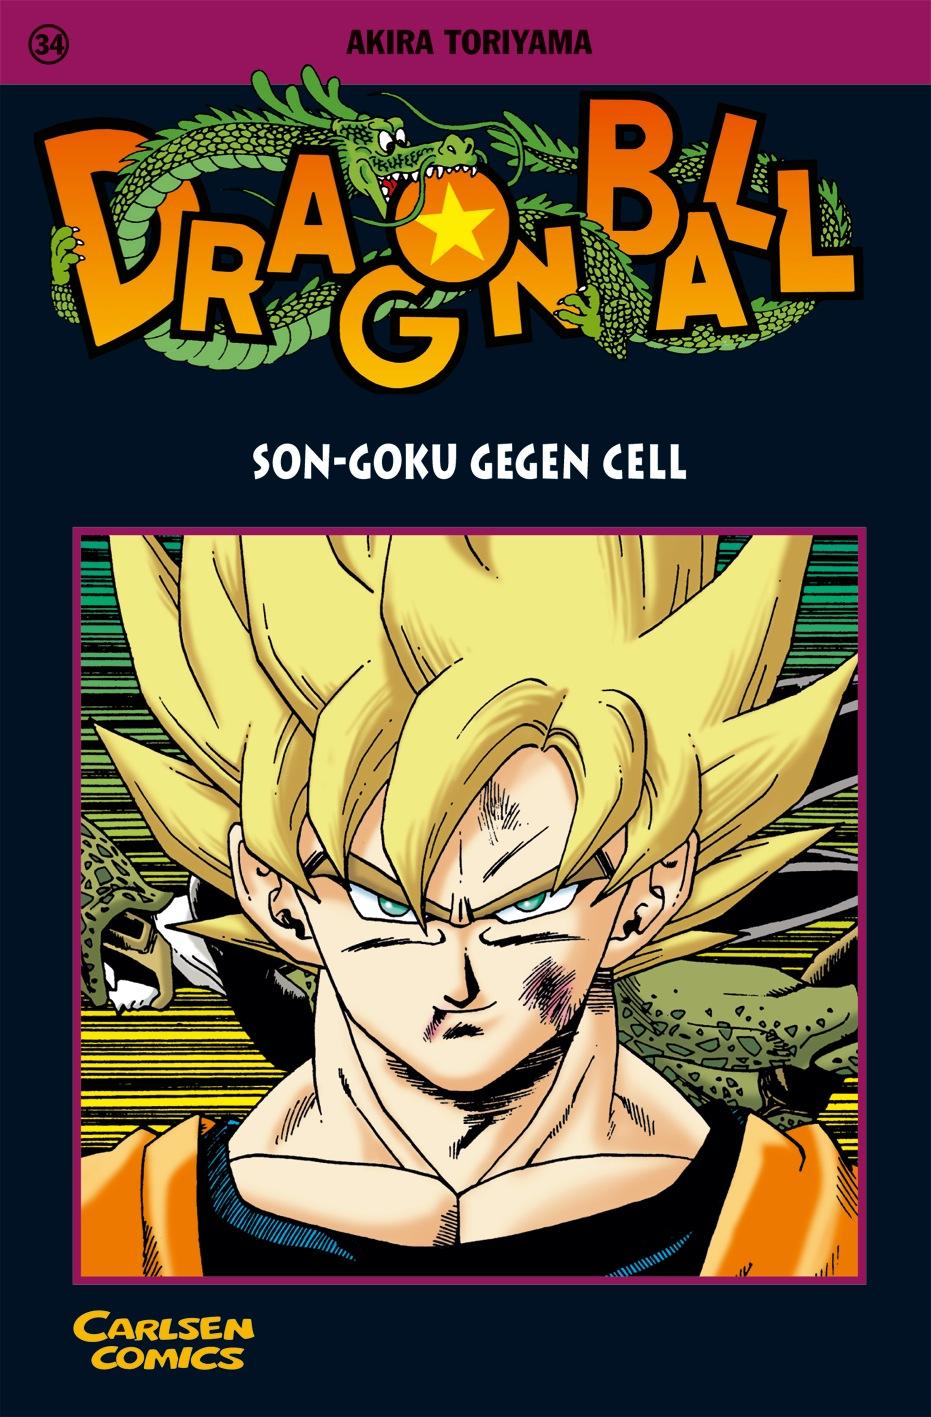 Dragon Ball Bd. 34 - Akira Toriyama